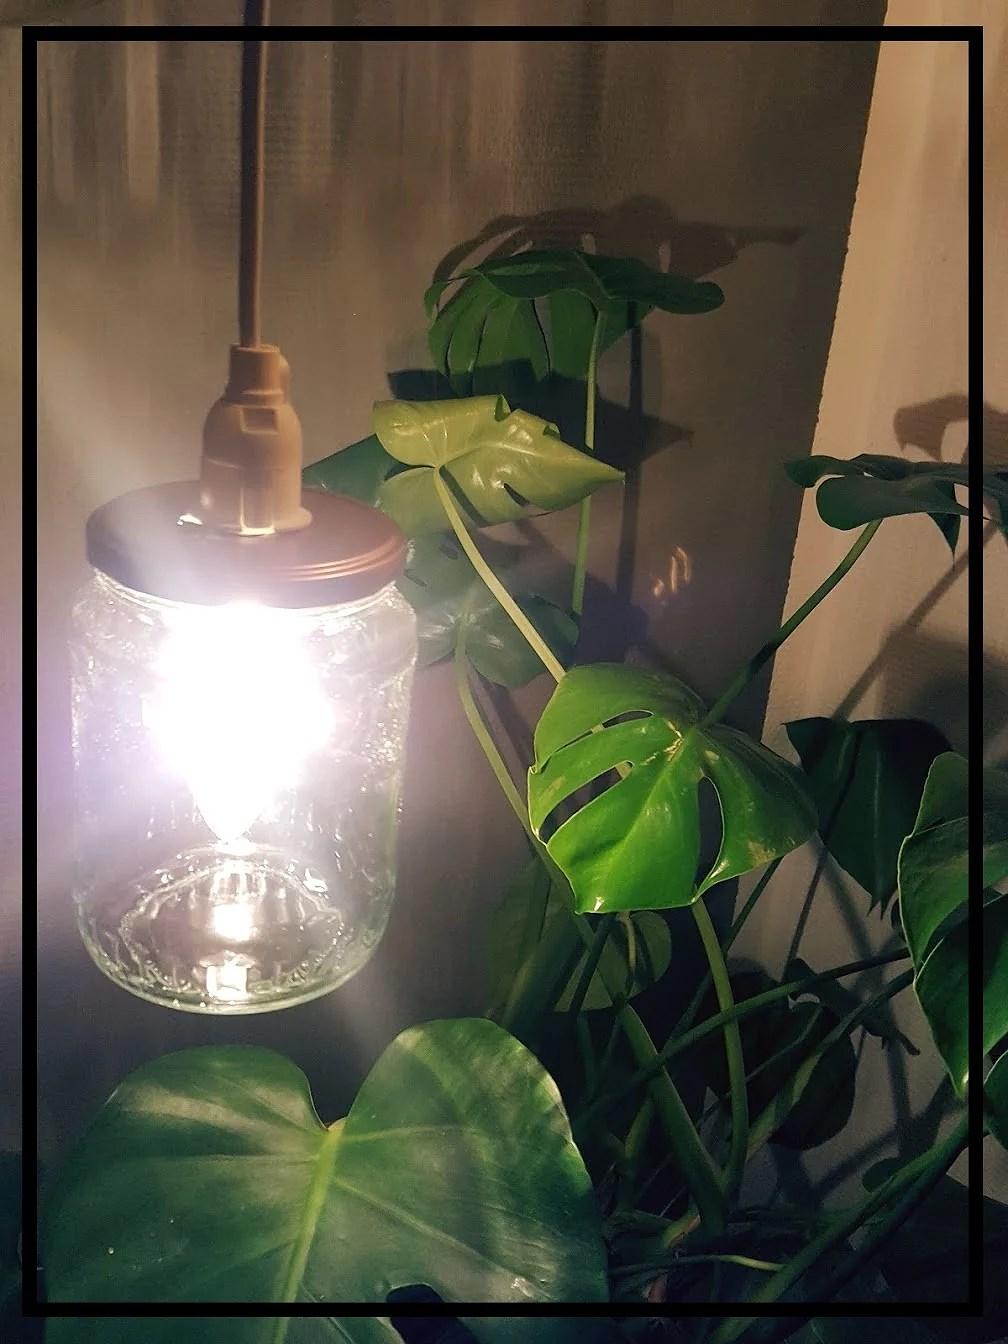 GenbrugsGlaskrukke #9 - Lampe